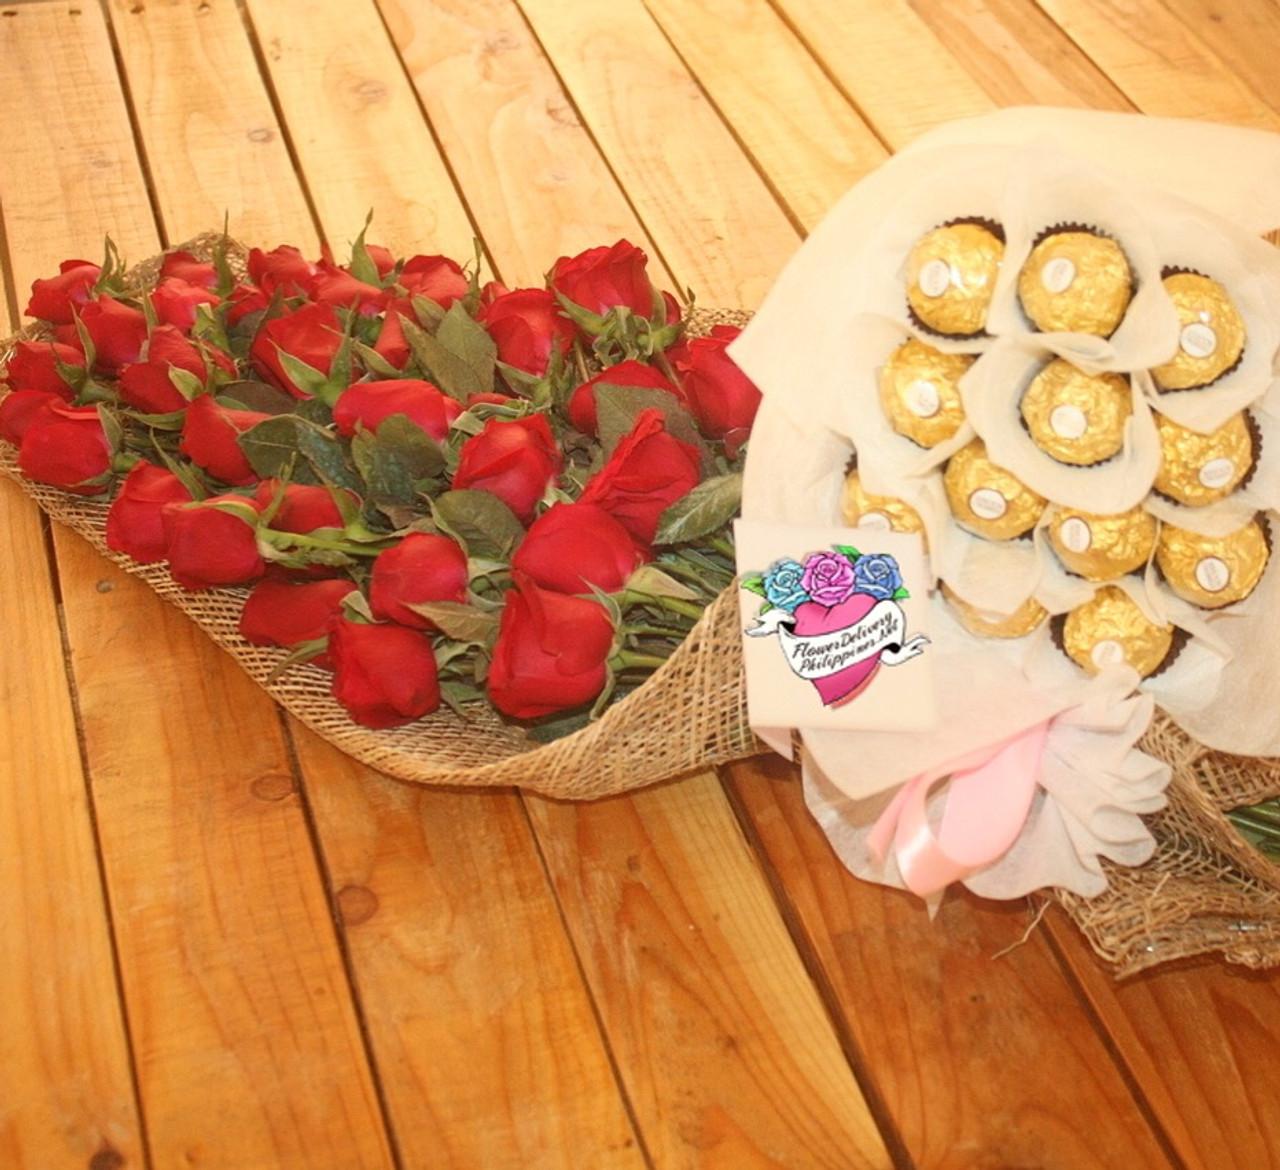 12 Roses Bouquet & 12 Ferrero Bouquet